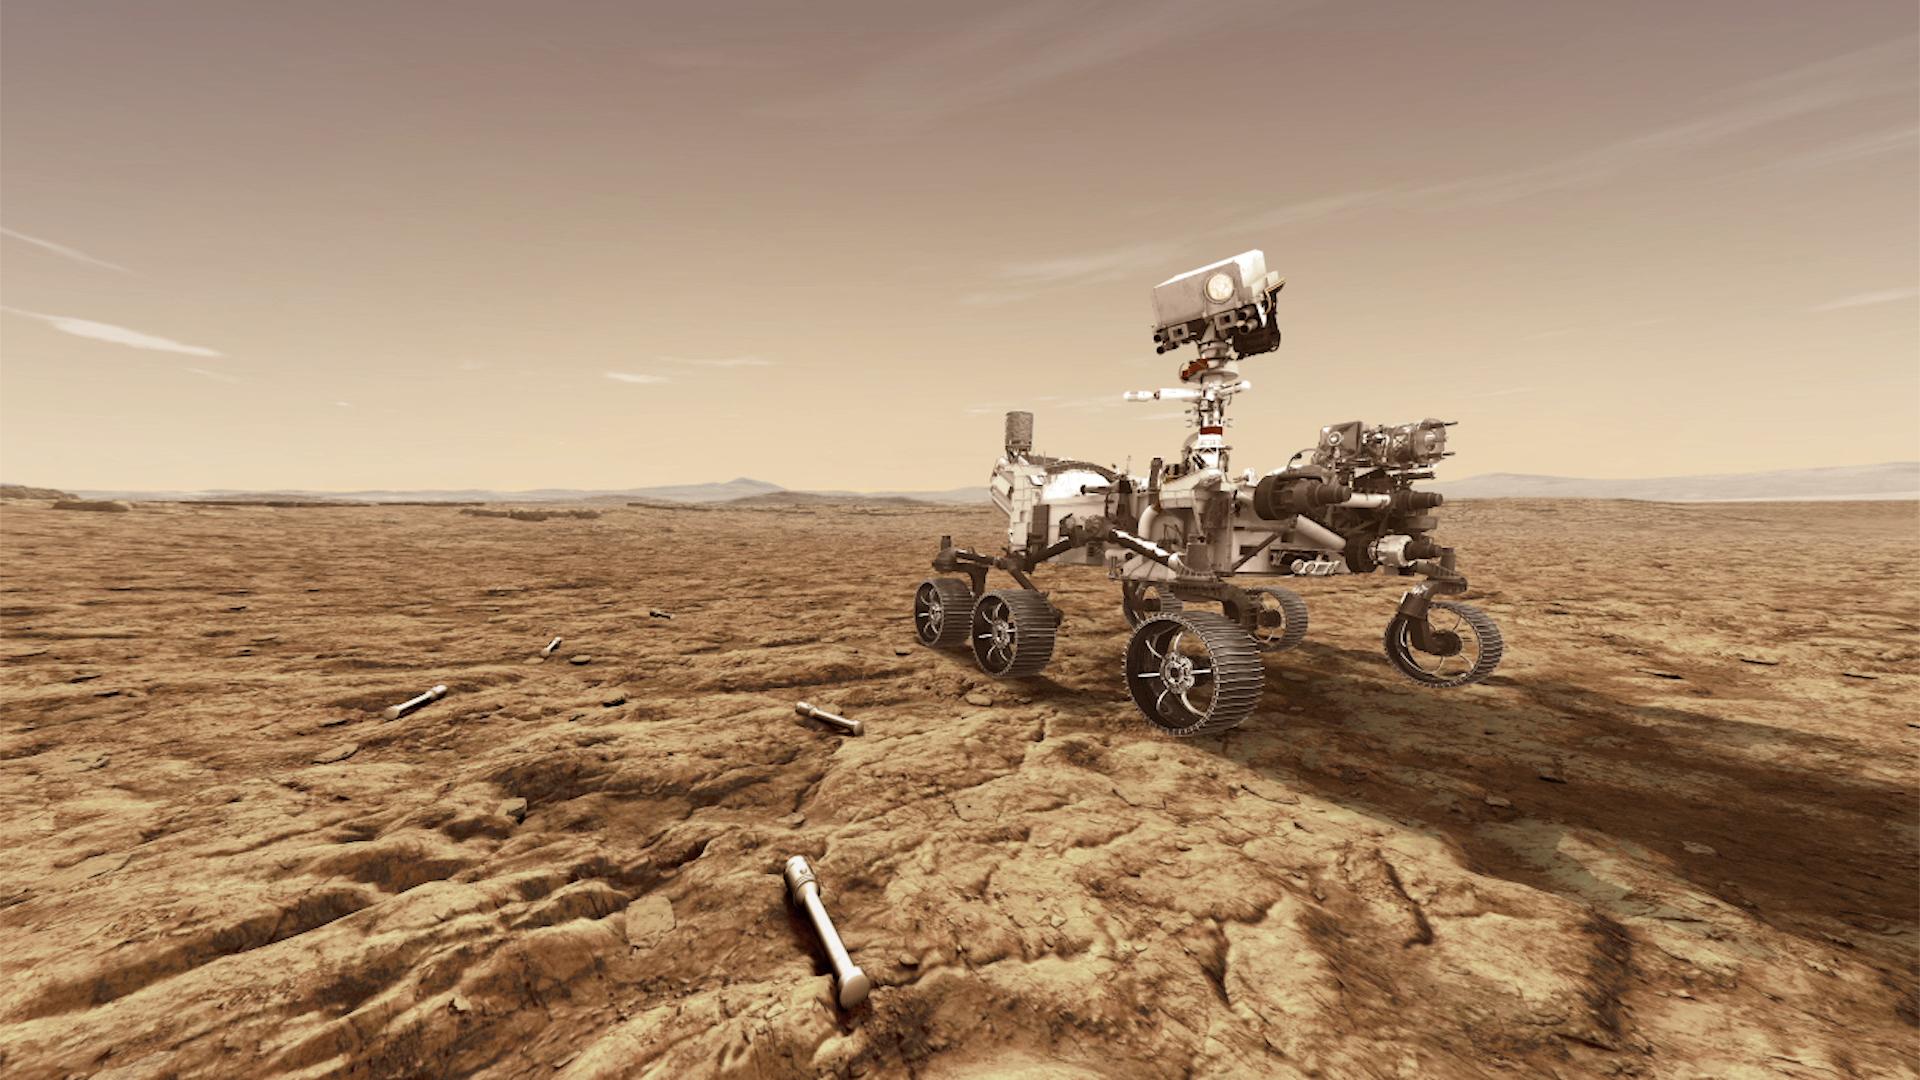 https://www.numerama.com/wp-content/uploads/2020/04/mars-2020-perseverance-echantillons-espace-rover.jpg